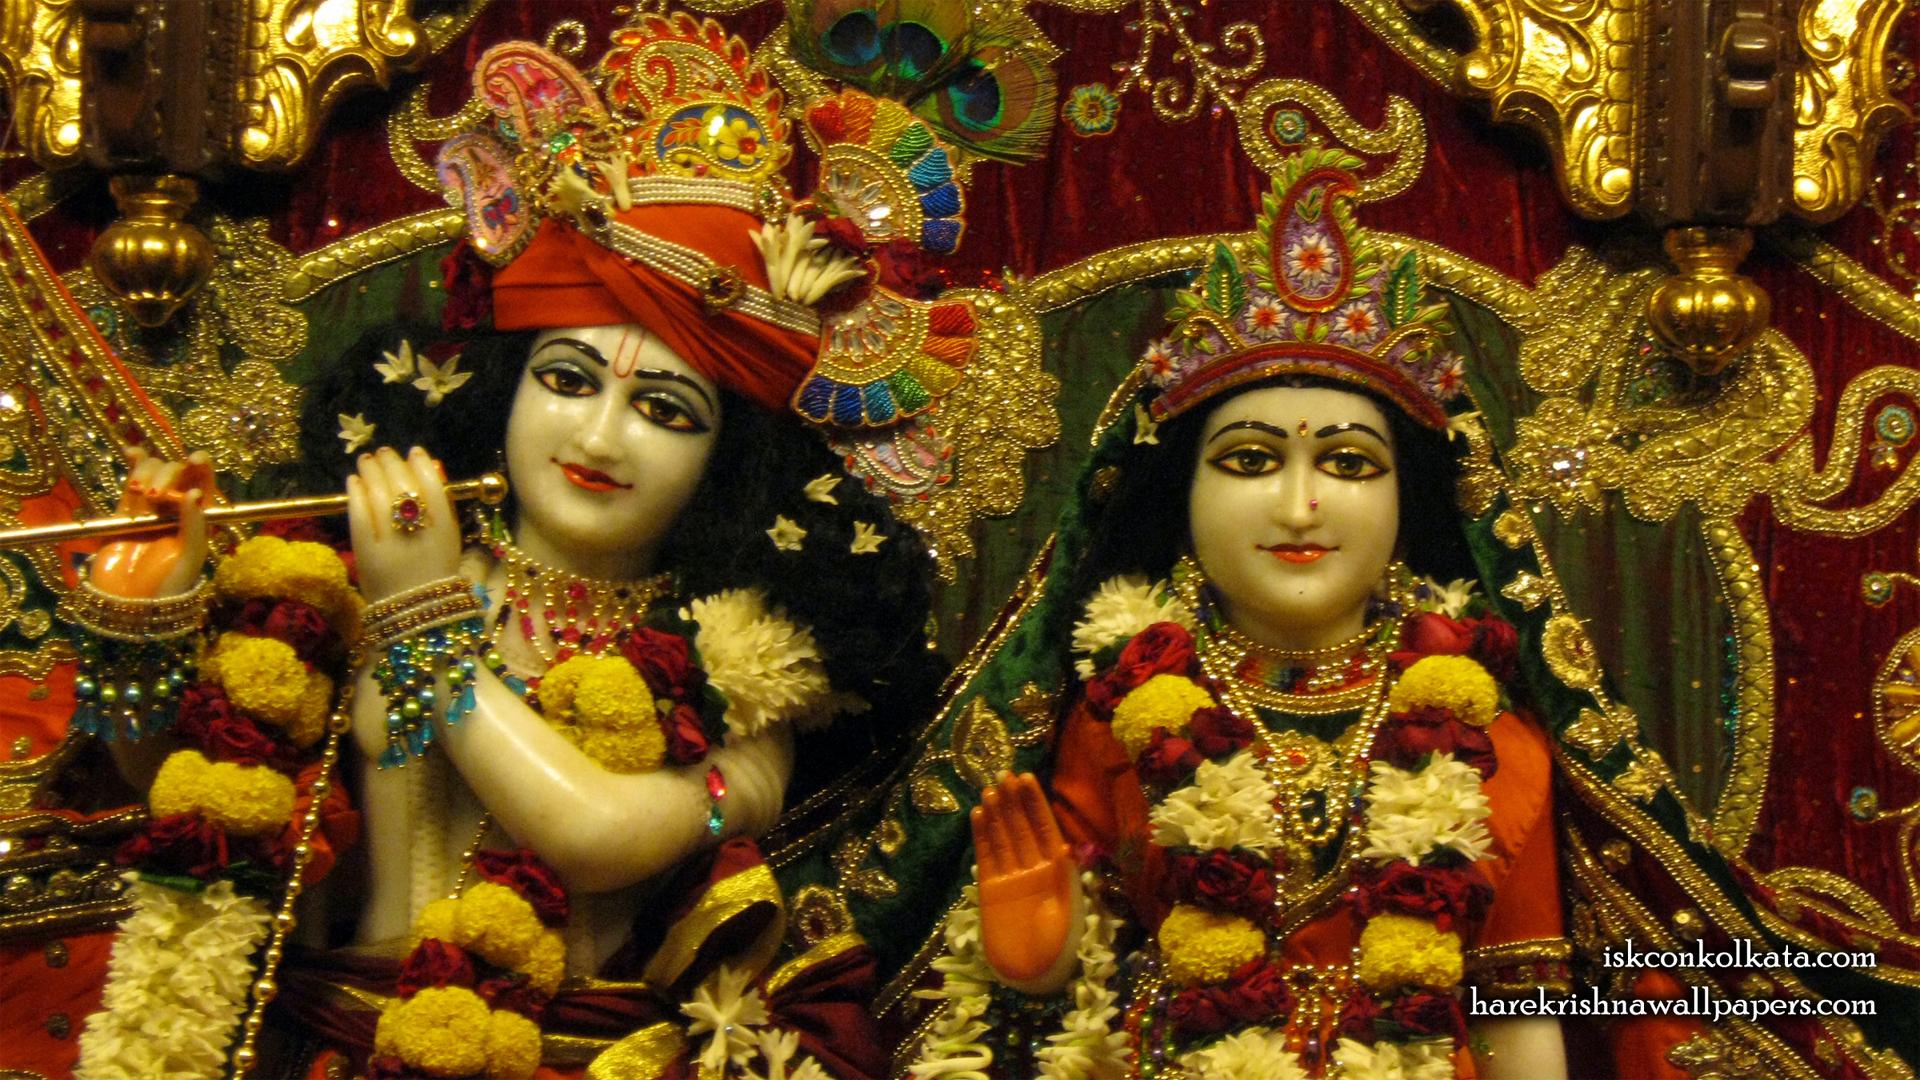 Sri Sri Radha Govinda Close up Wallpaper (002) Size 1920x1080 Download